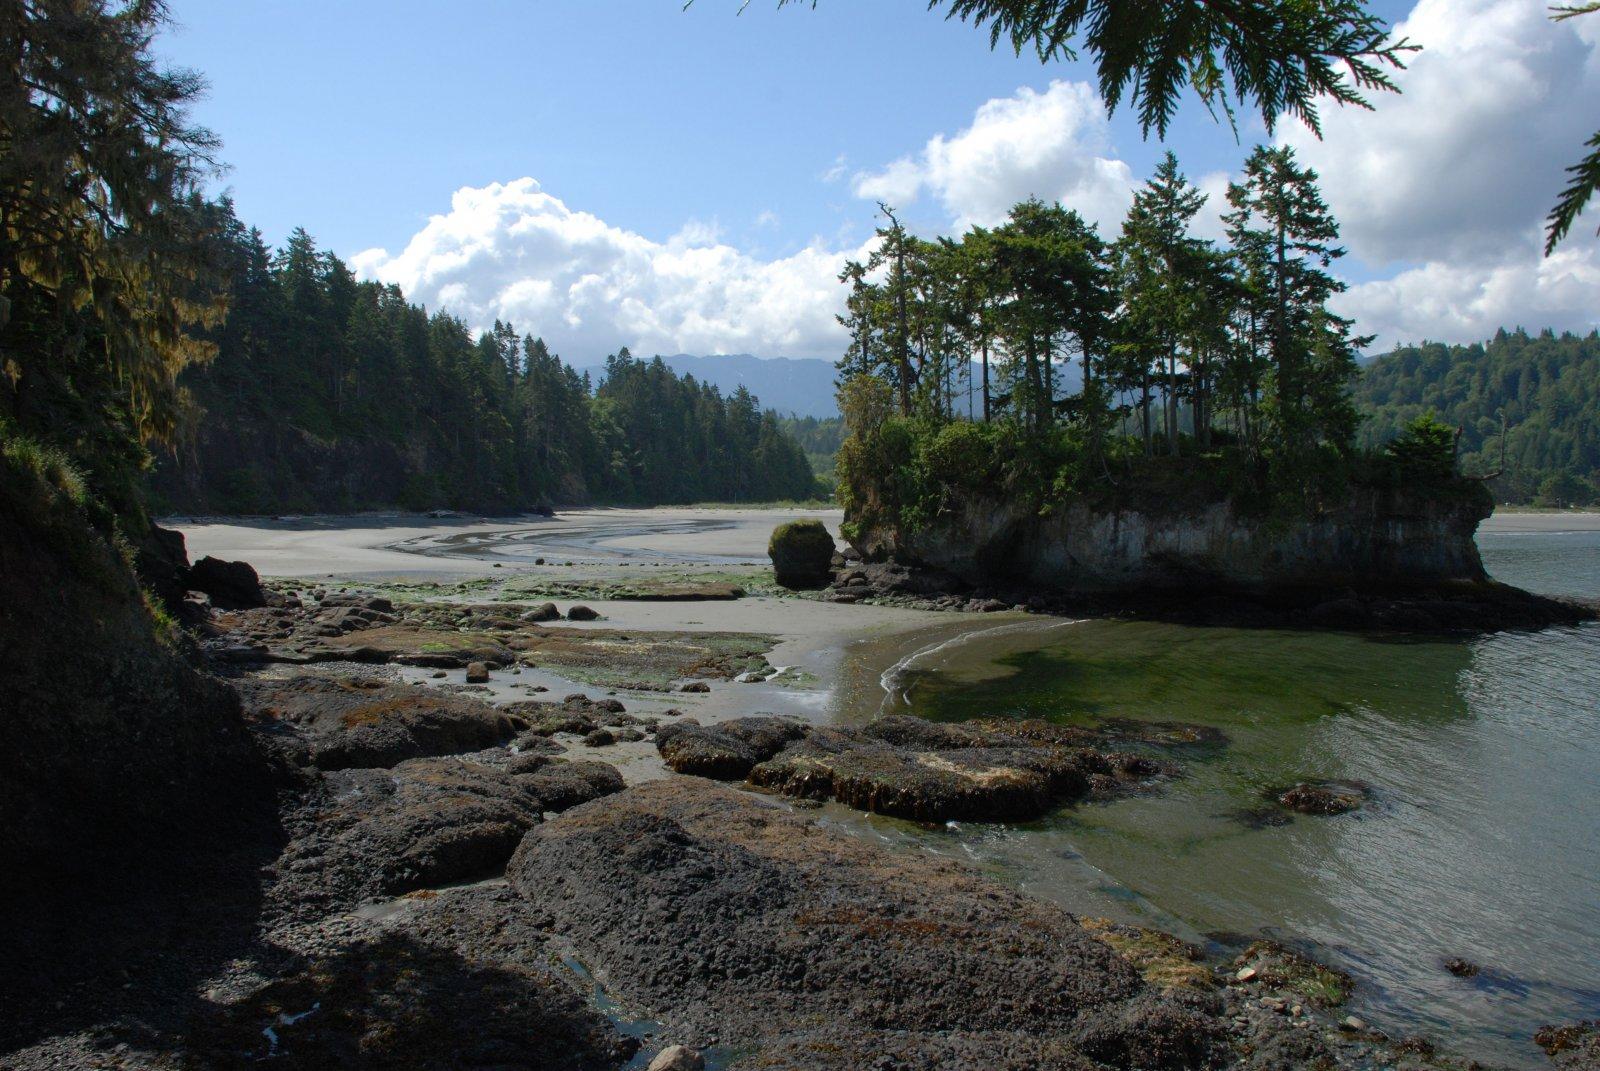 Click image for larger version  Name:Salt Creek Rec Area Low Tide at 4G Point.jpg Views:77 Size:357.0 KB ID:217638